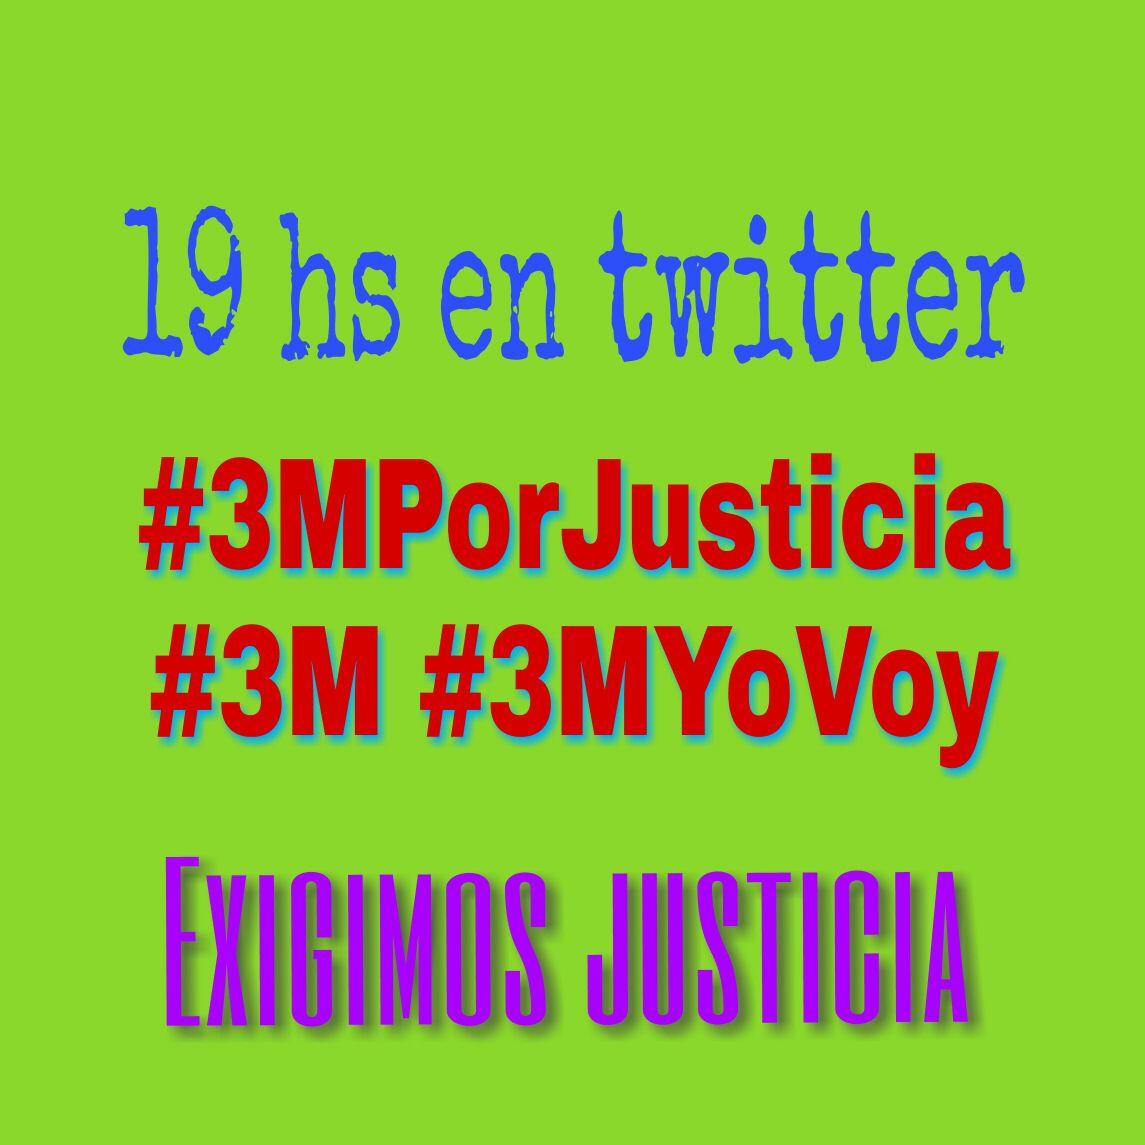 #JuevesIntratable Latest News Trends Updates Images - SiquierVera